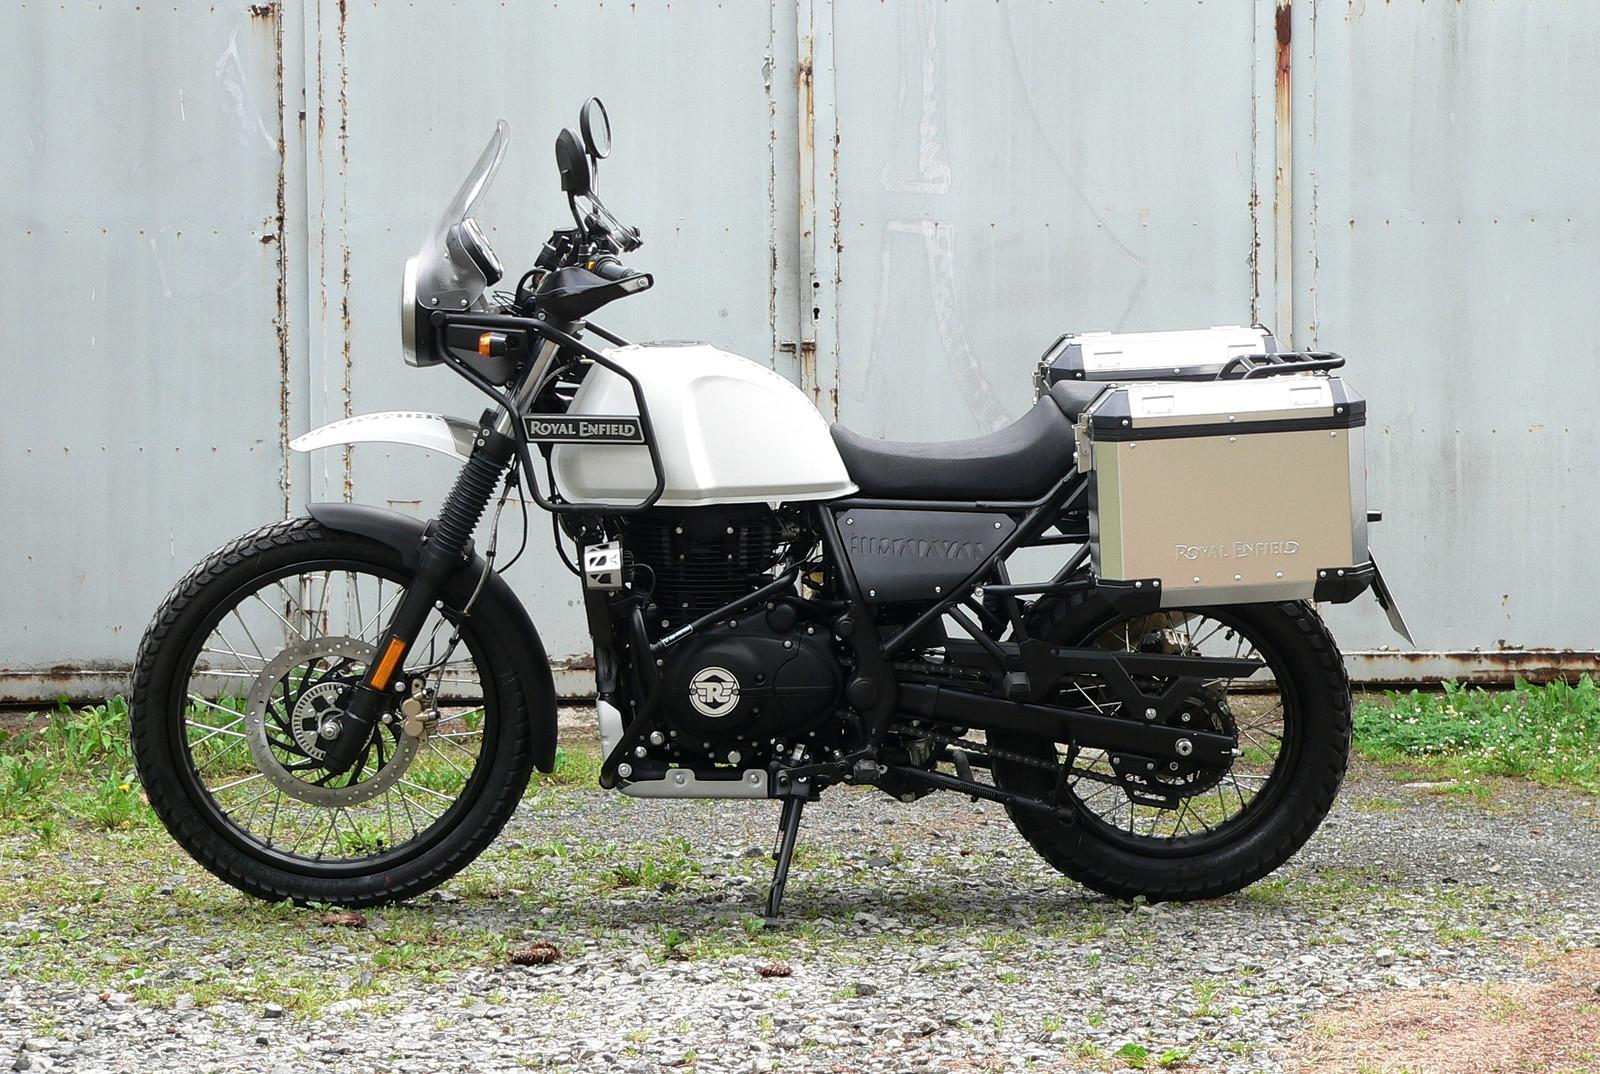 omega kraftrad gmbh custombike braunschweig himalayan. Black Bedroom Furniture Sets. Home Design Ideas